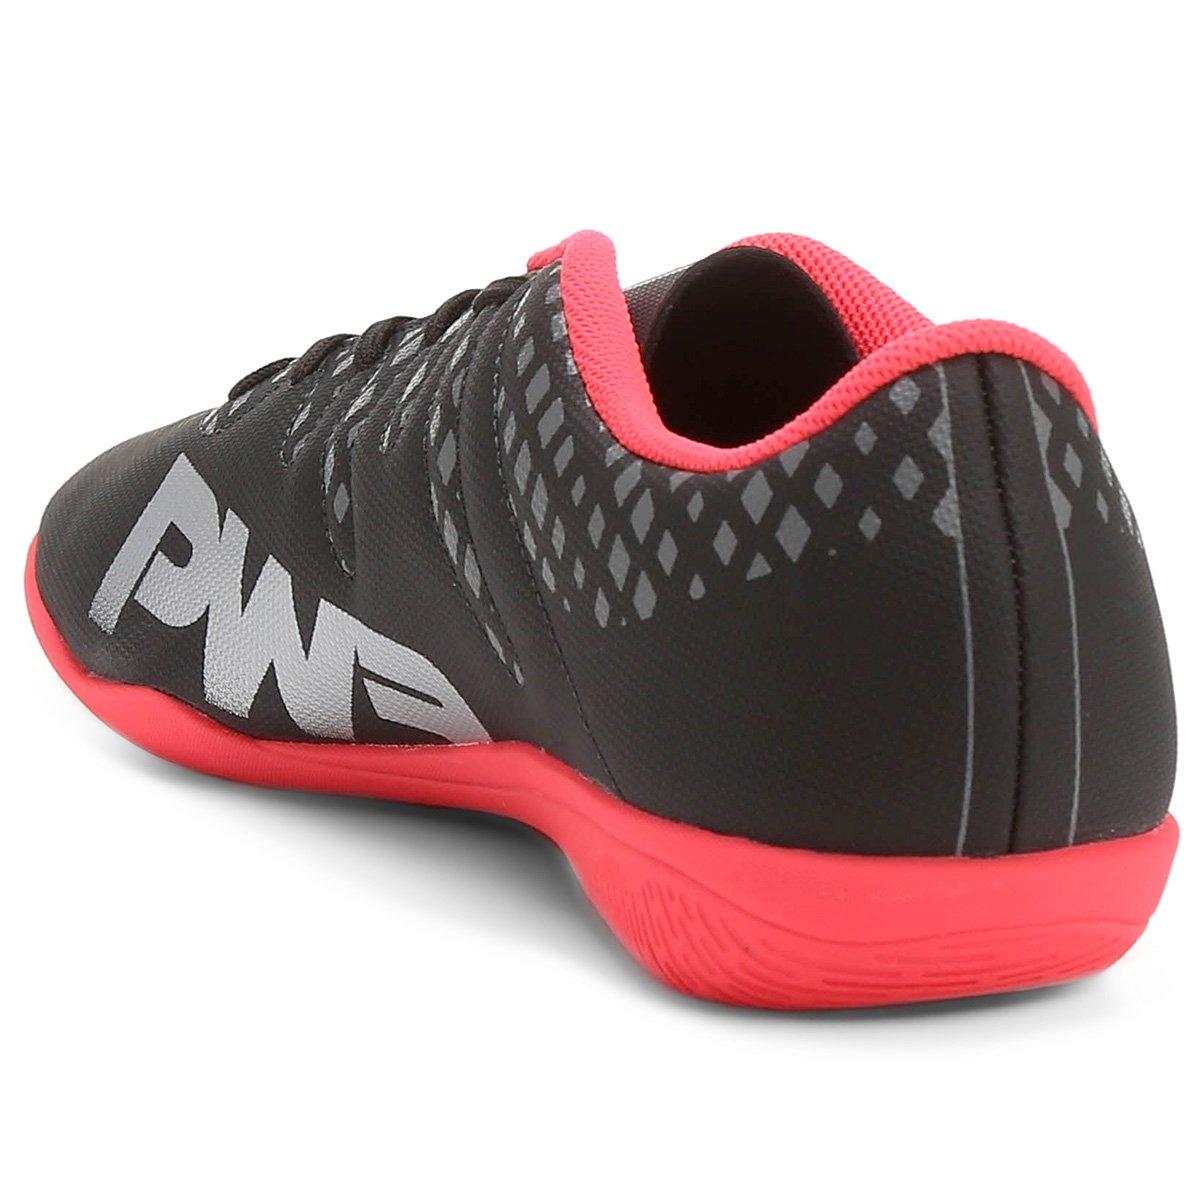 Chuteira Futsal Puma Evopower Vigor 4 IT Masculina - Preto e Prata ... d435ec2539a28